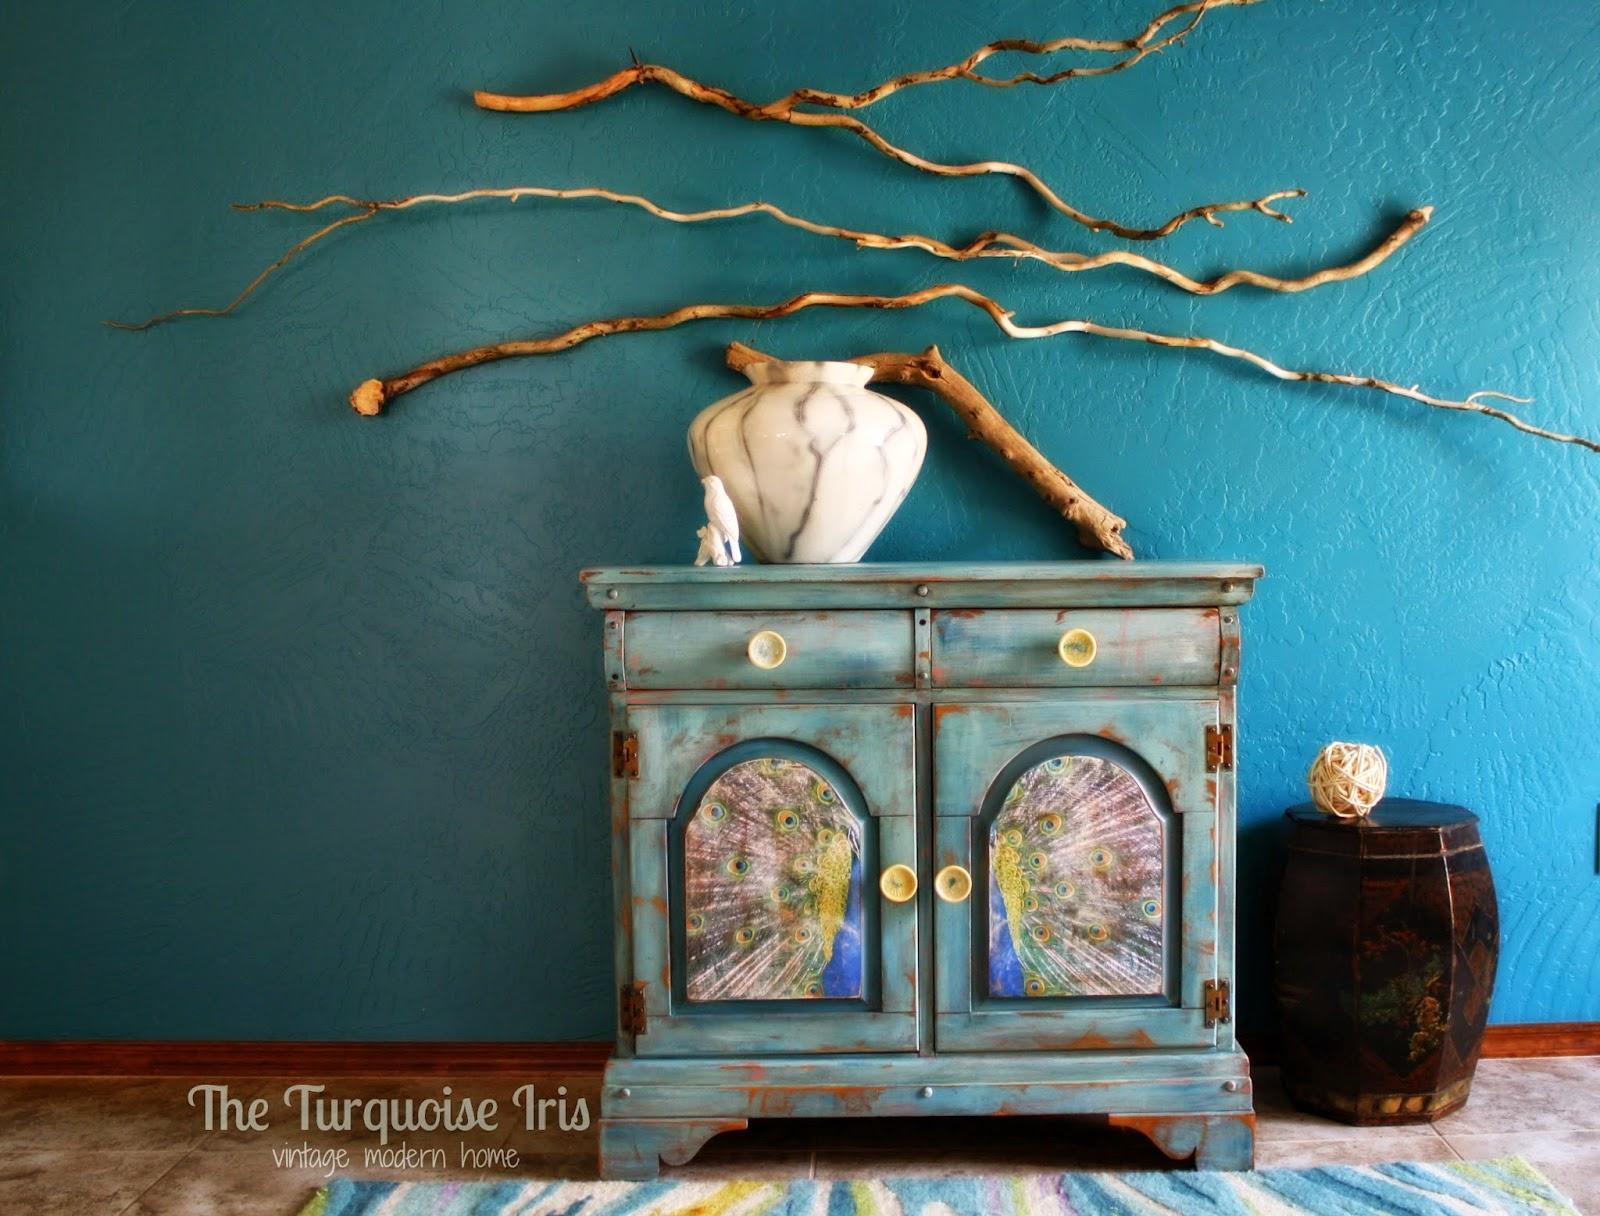 El estilo atrevido de The Turquoise Iris